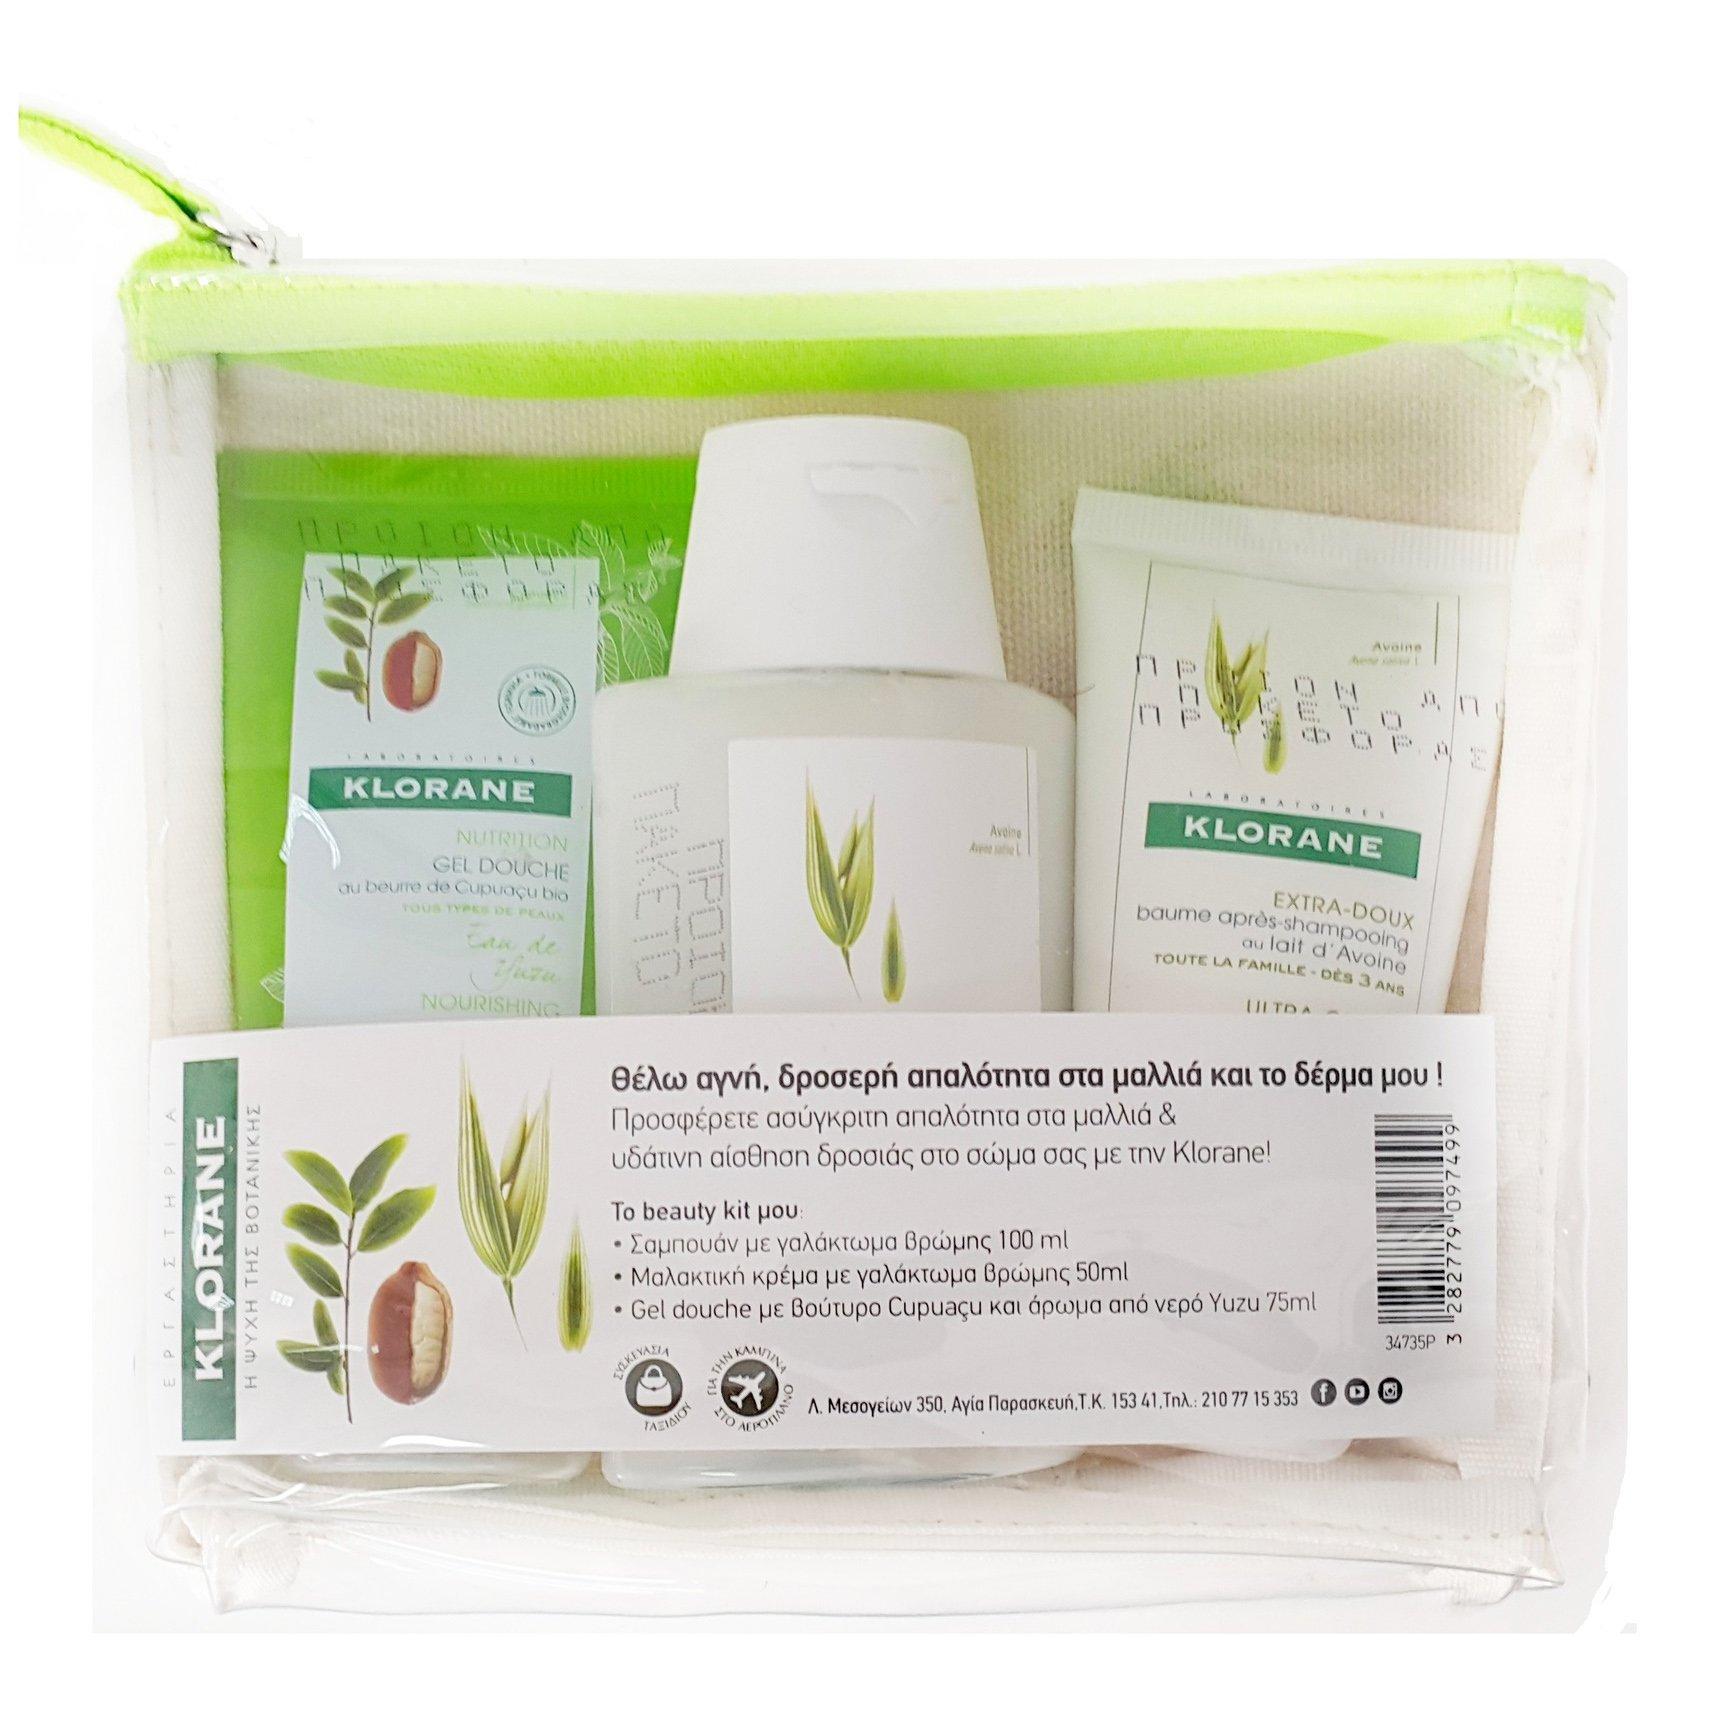 Klorane Travel Size Shampoo με Γαλάκτωμα Βρώμης 100ml,Nutrition Baume Μαλακτική με Βρώμη 50ml,Gel Douche με Βούτυρο Cupuacu 75ml